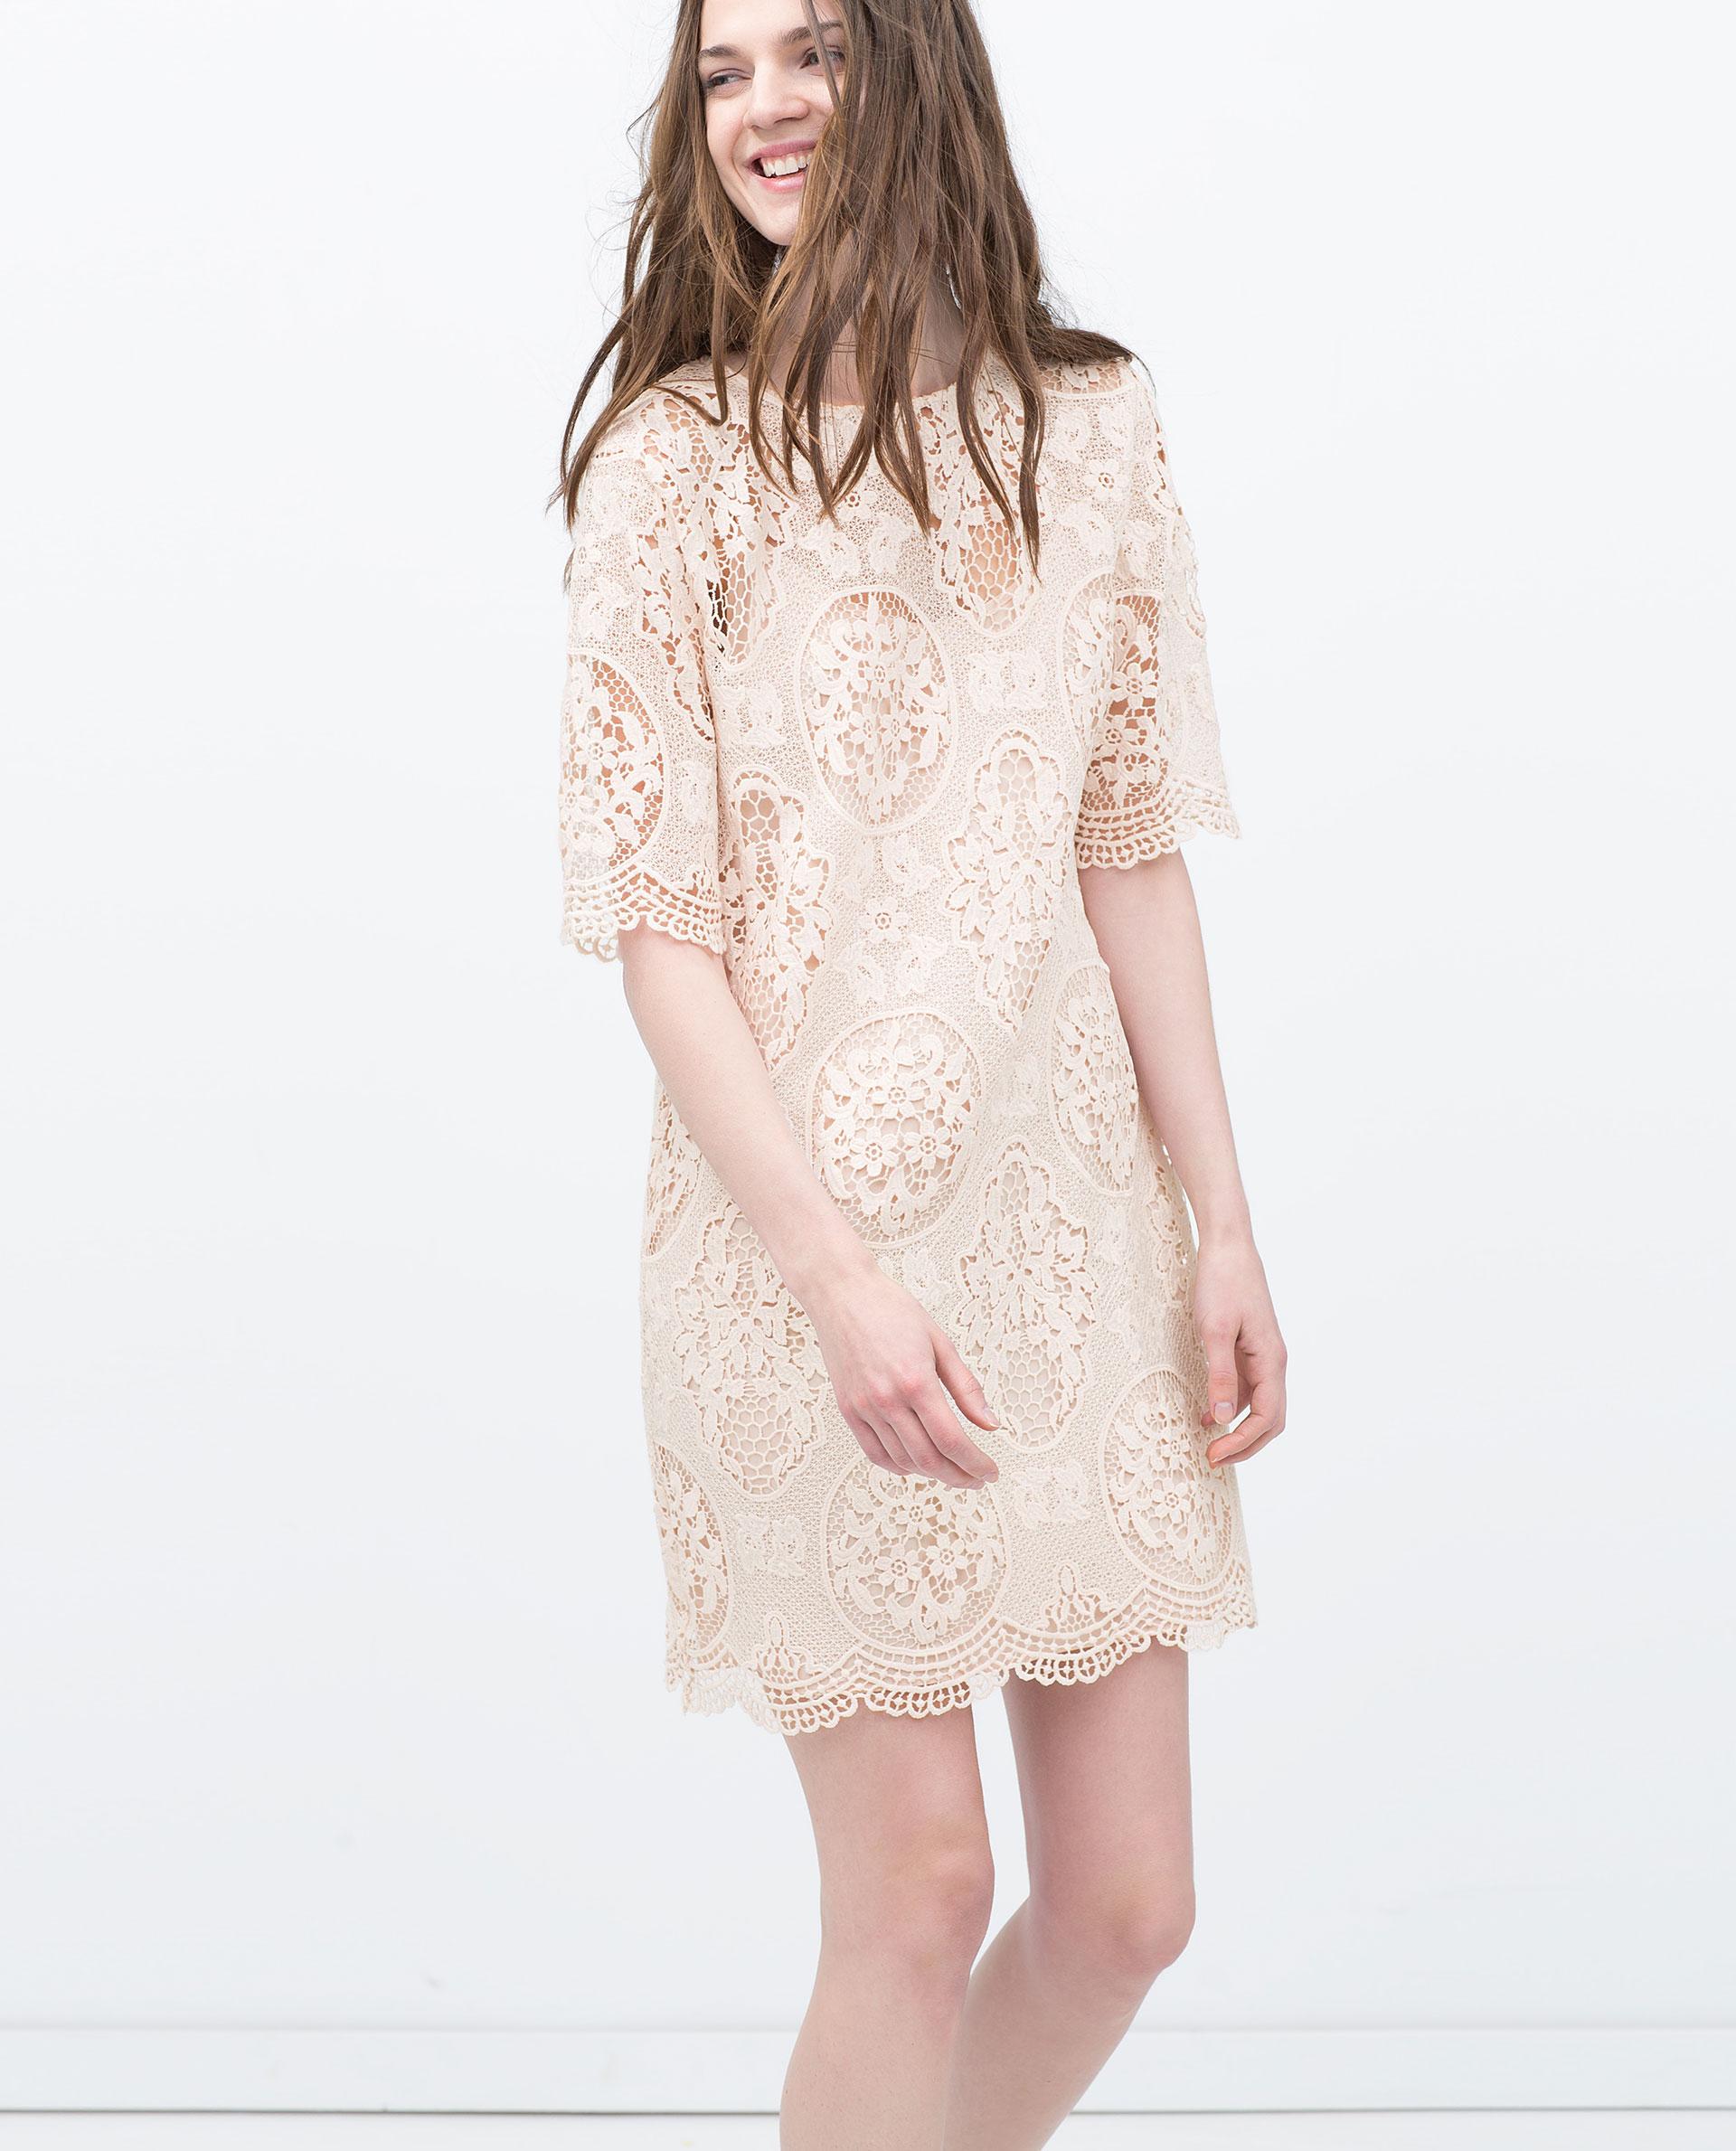 Galerry lace dress zara 2015